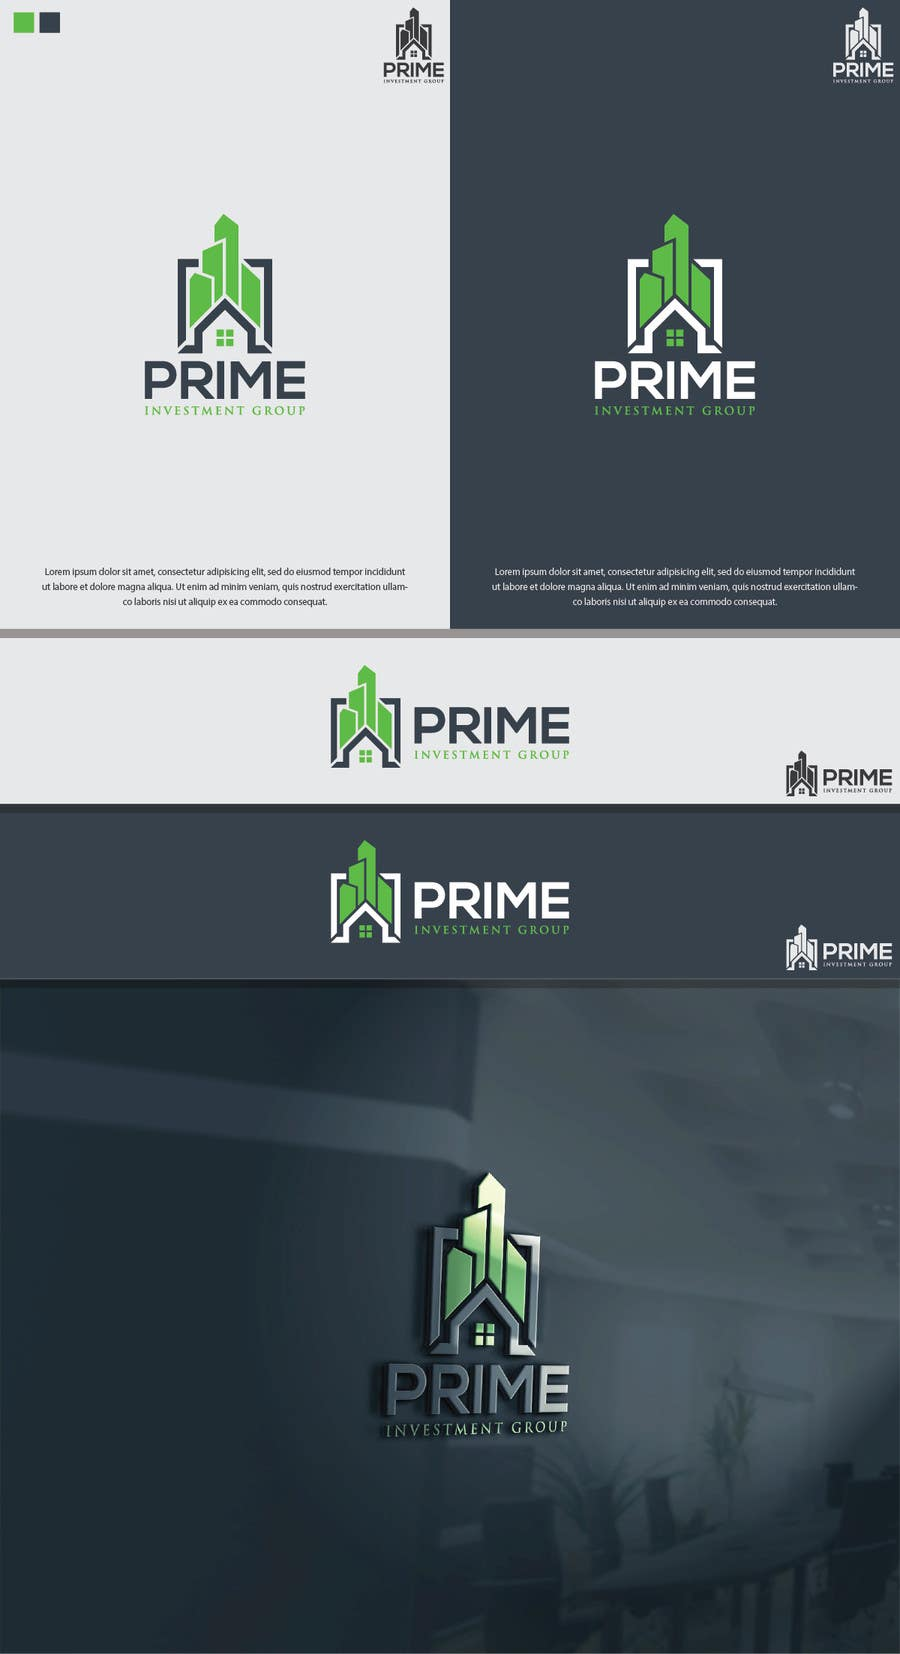 Wasilisho la Shindano #186 la Design a Logo for Prime Investment Group